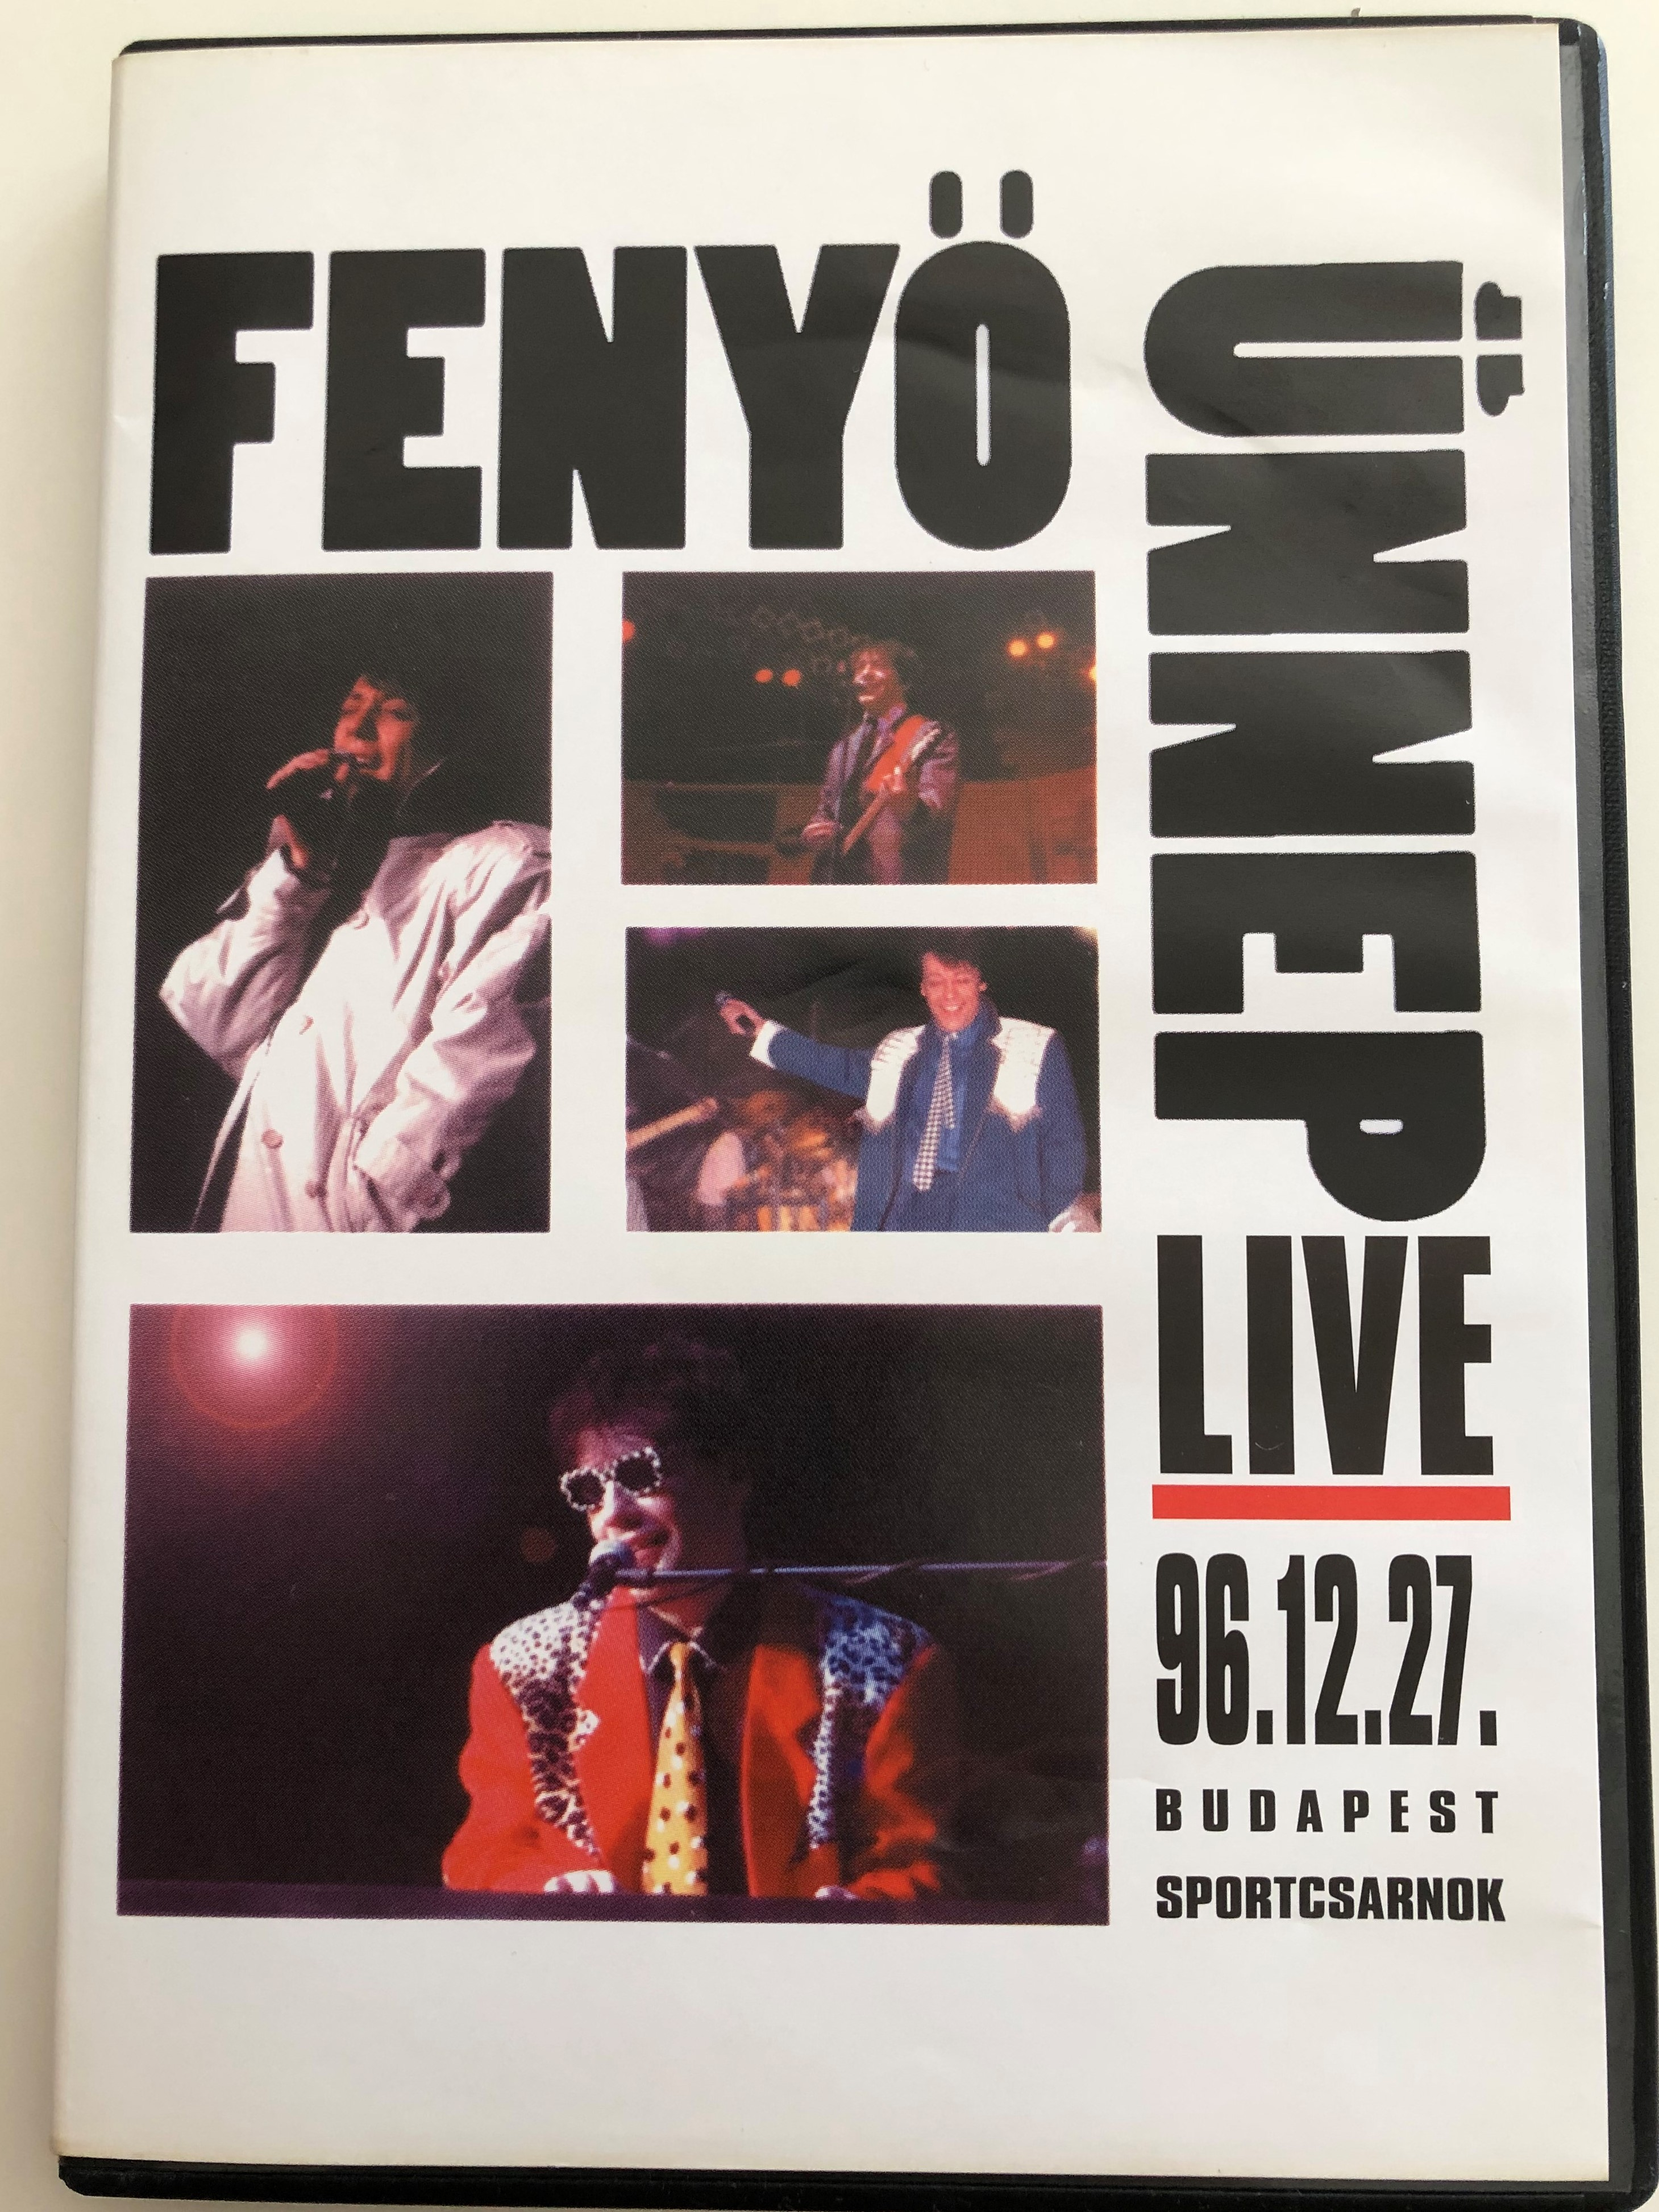 feny-nnep-live-dvd-1996-96.12.27-budapest-sportcsarnok-2-dvd-live-concert-recording-magneoton-produced-by-r-zsa-istv-n-1-.jpg